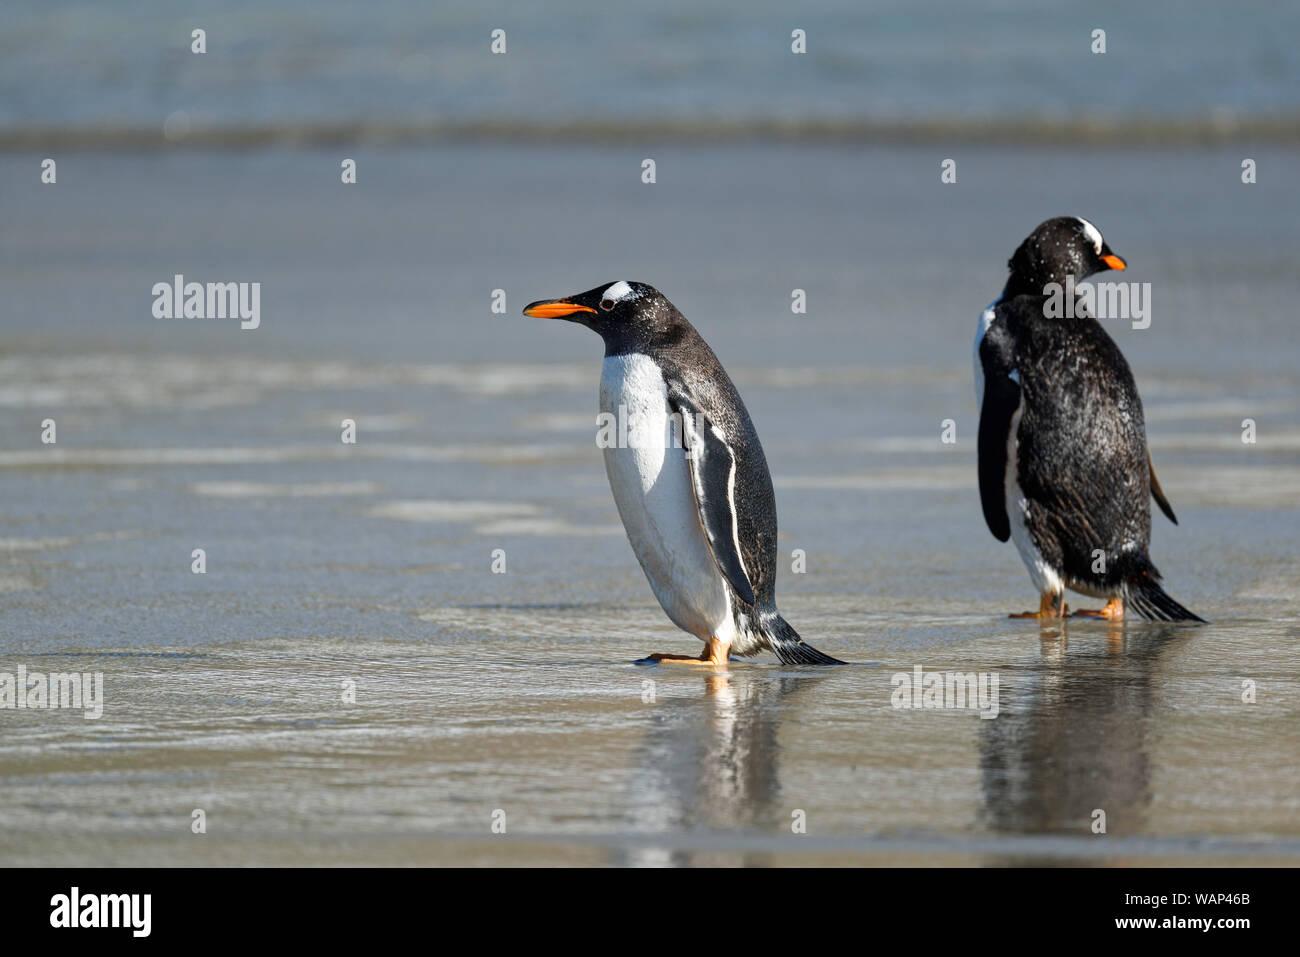 Zwei Eselspinguine (Pygoscelis papua) am Strand, Falkland Inseln. Two gentoo penguins oh the beach, Falkland Islands Stock Photo